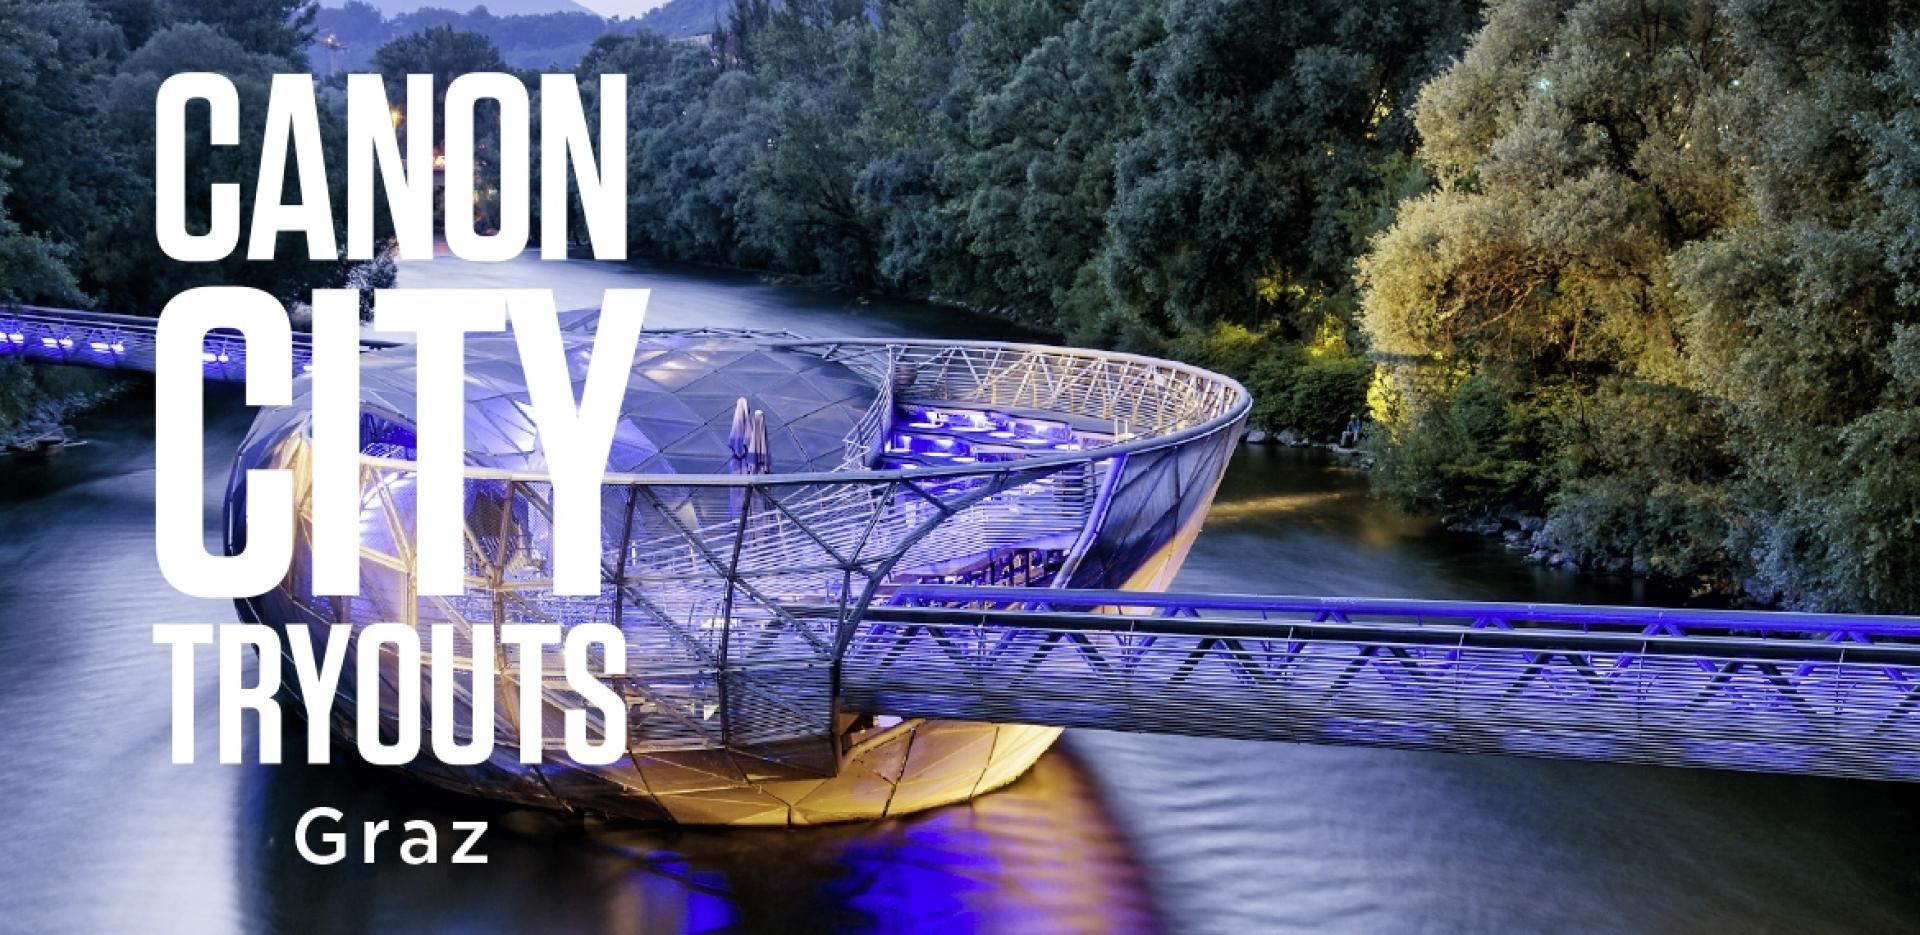 Canon City Tryouts in Graz - Canon Academy Spezialthemen